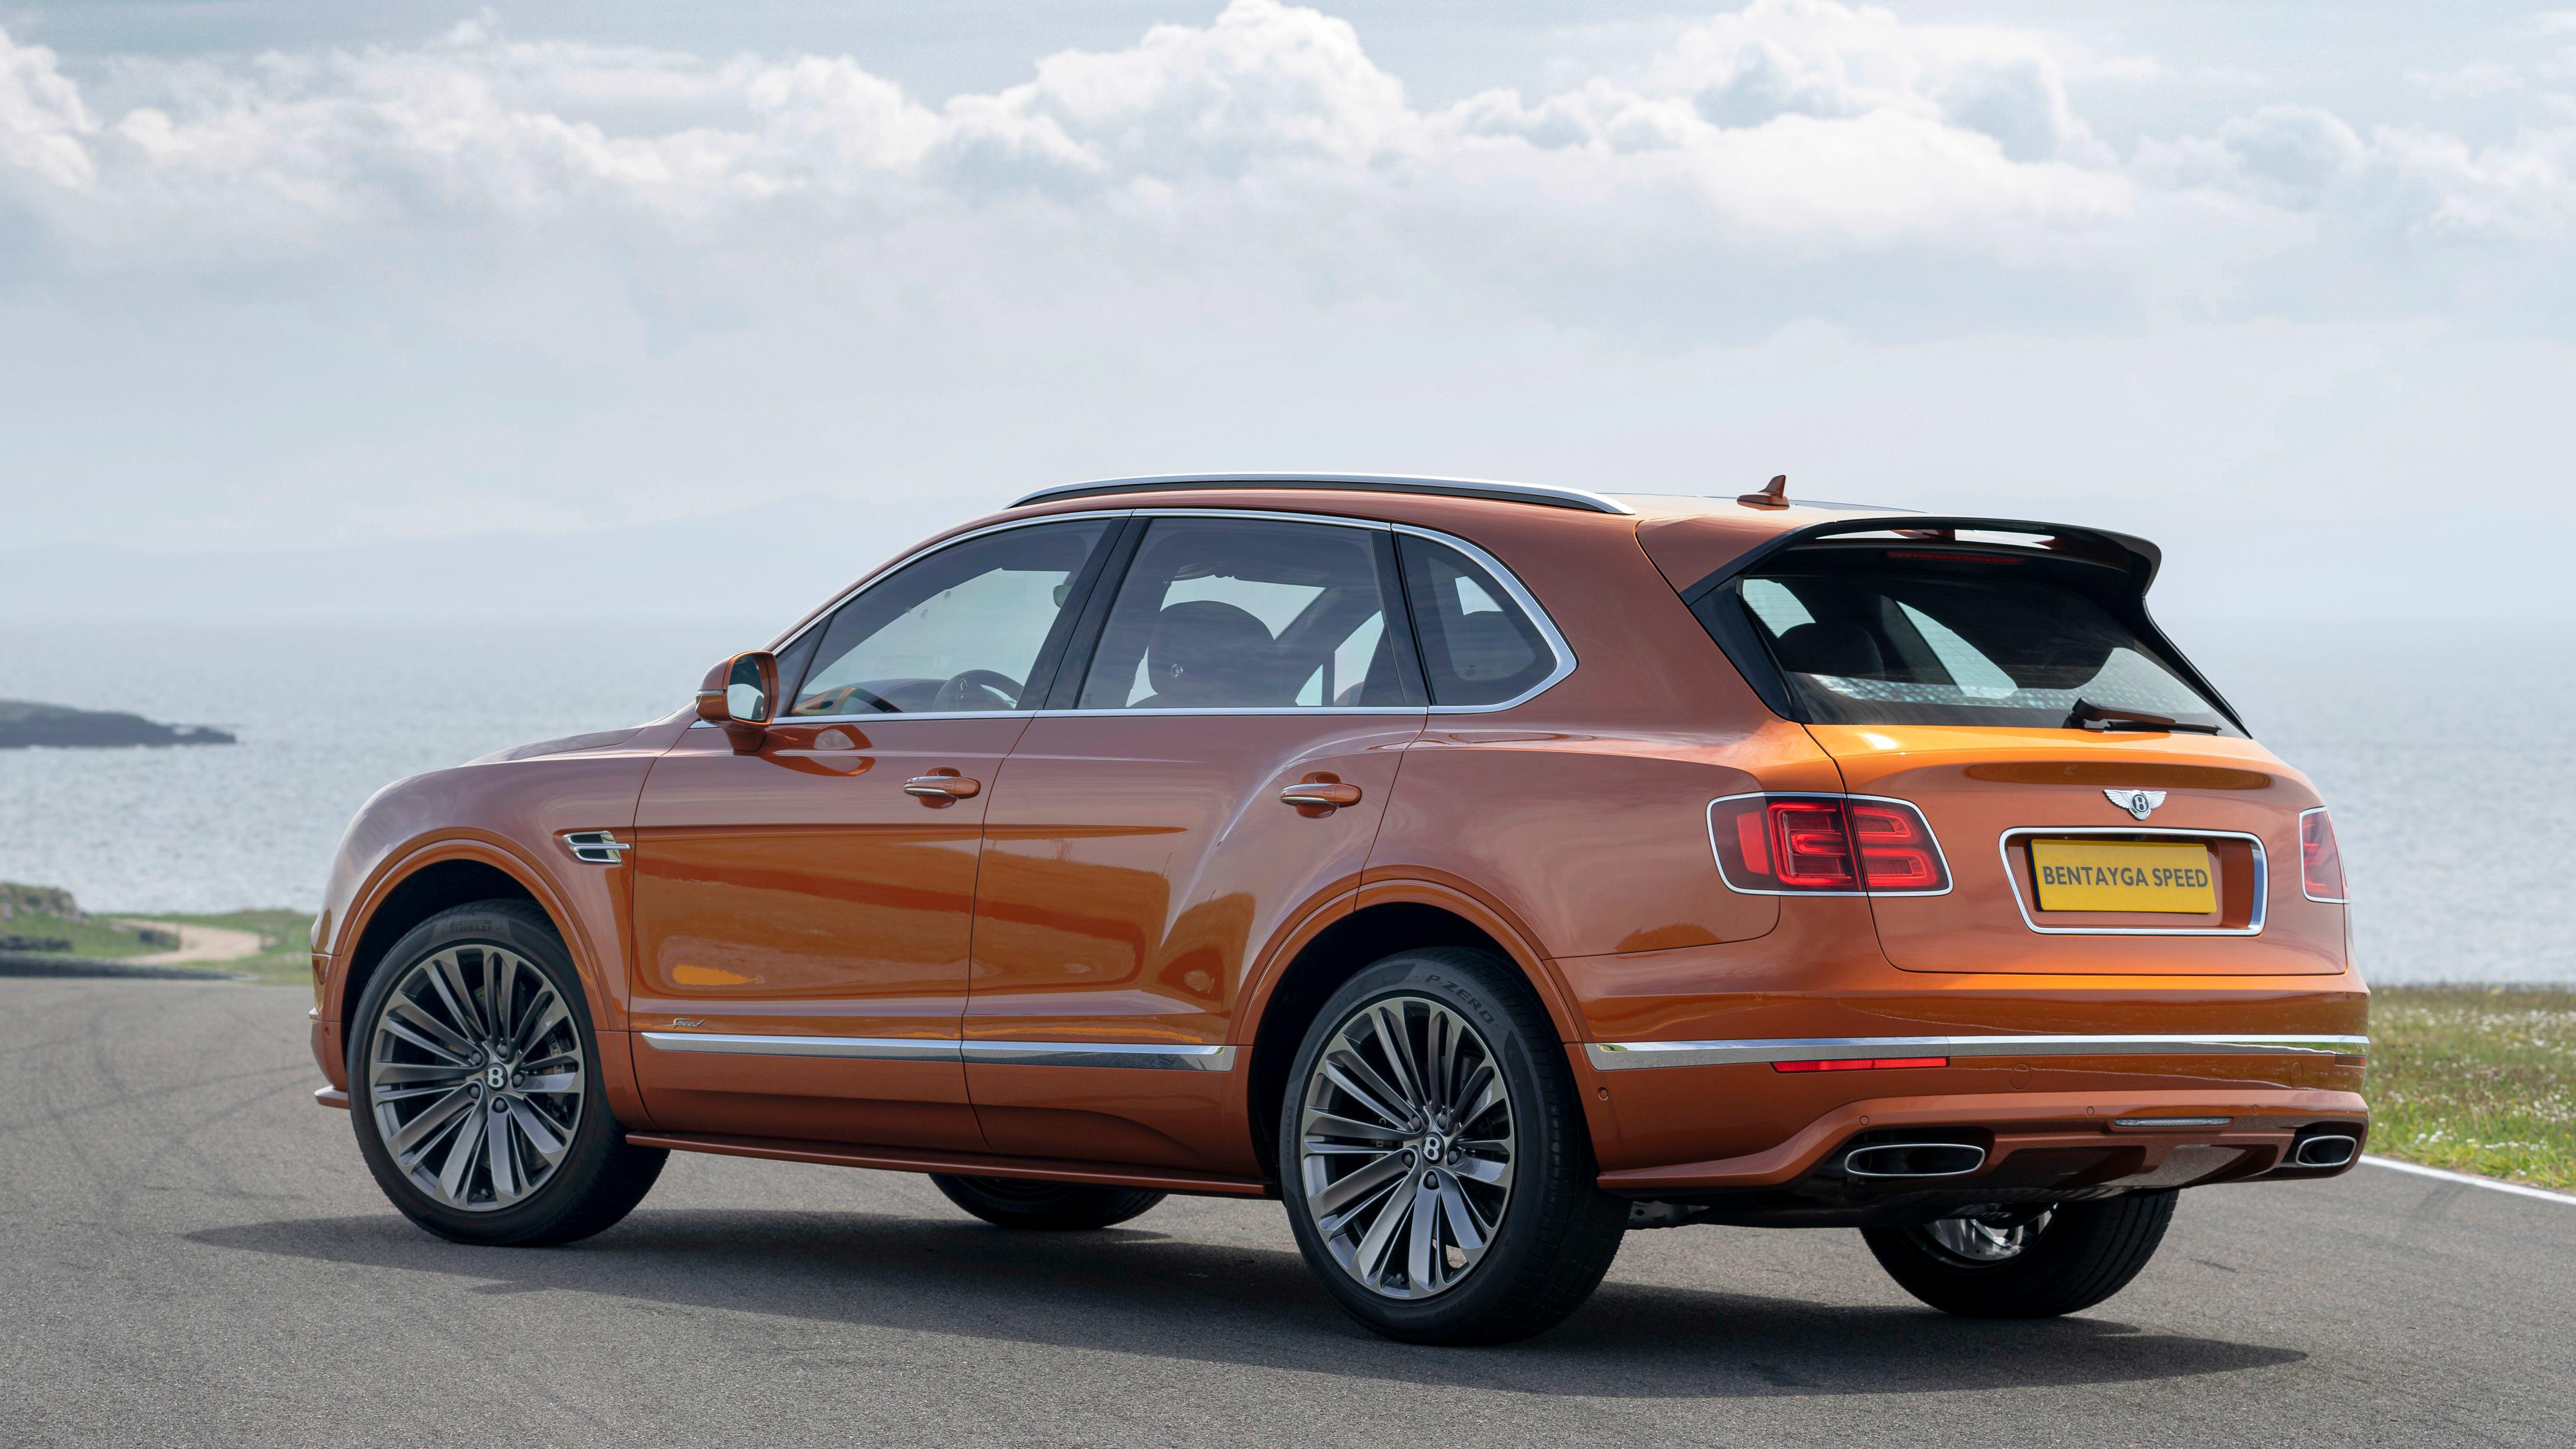 Bigger Bentley Bentayga Suv And A Facelift On The Way Caradvice